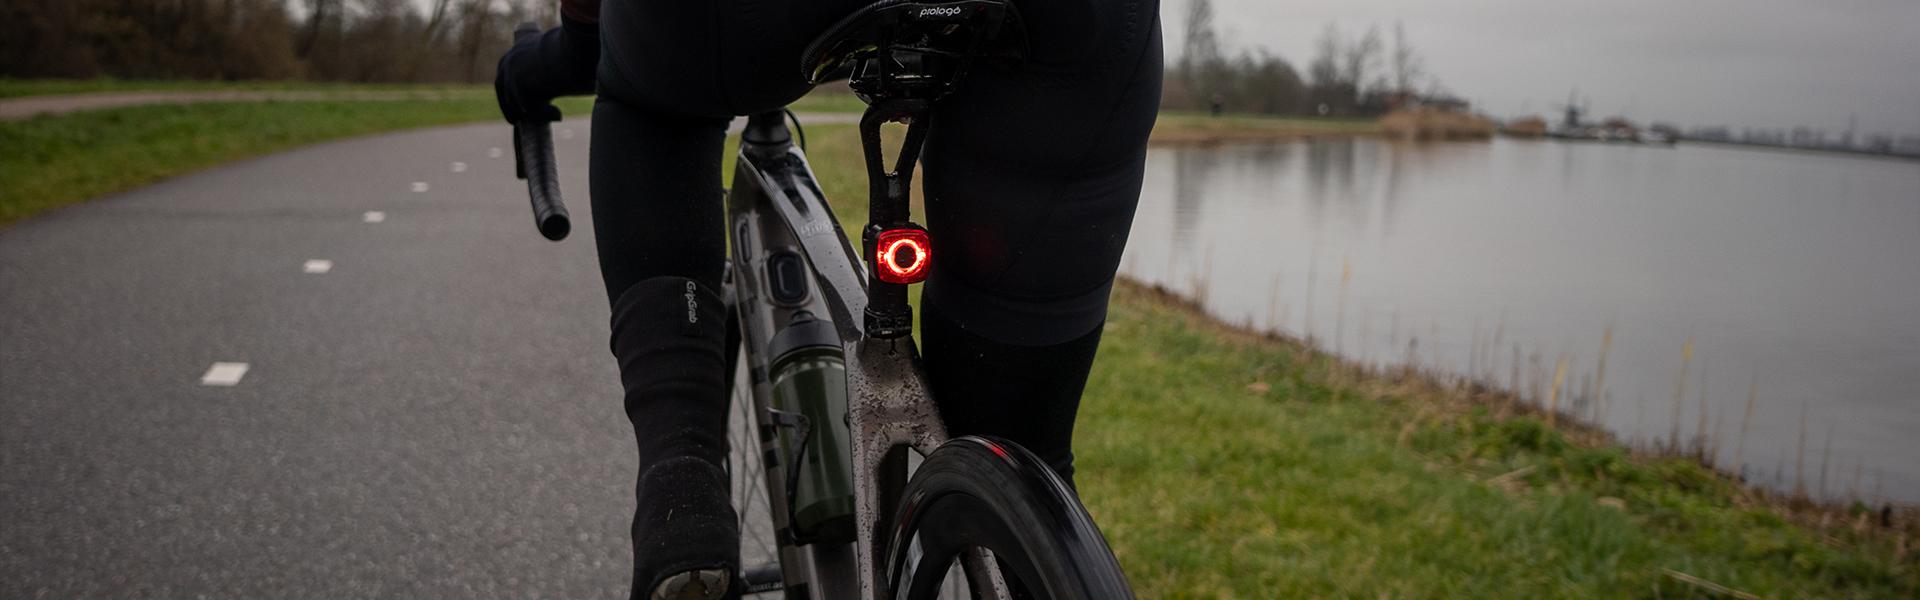 Sate-lite 50 LUX USB rechargeable bike light StVZO eletric bike front light OSRAM LED waterproof